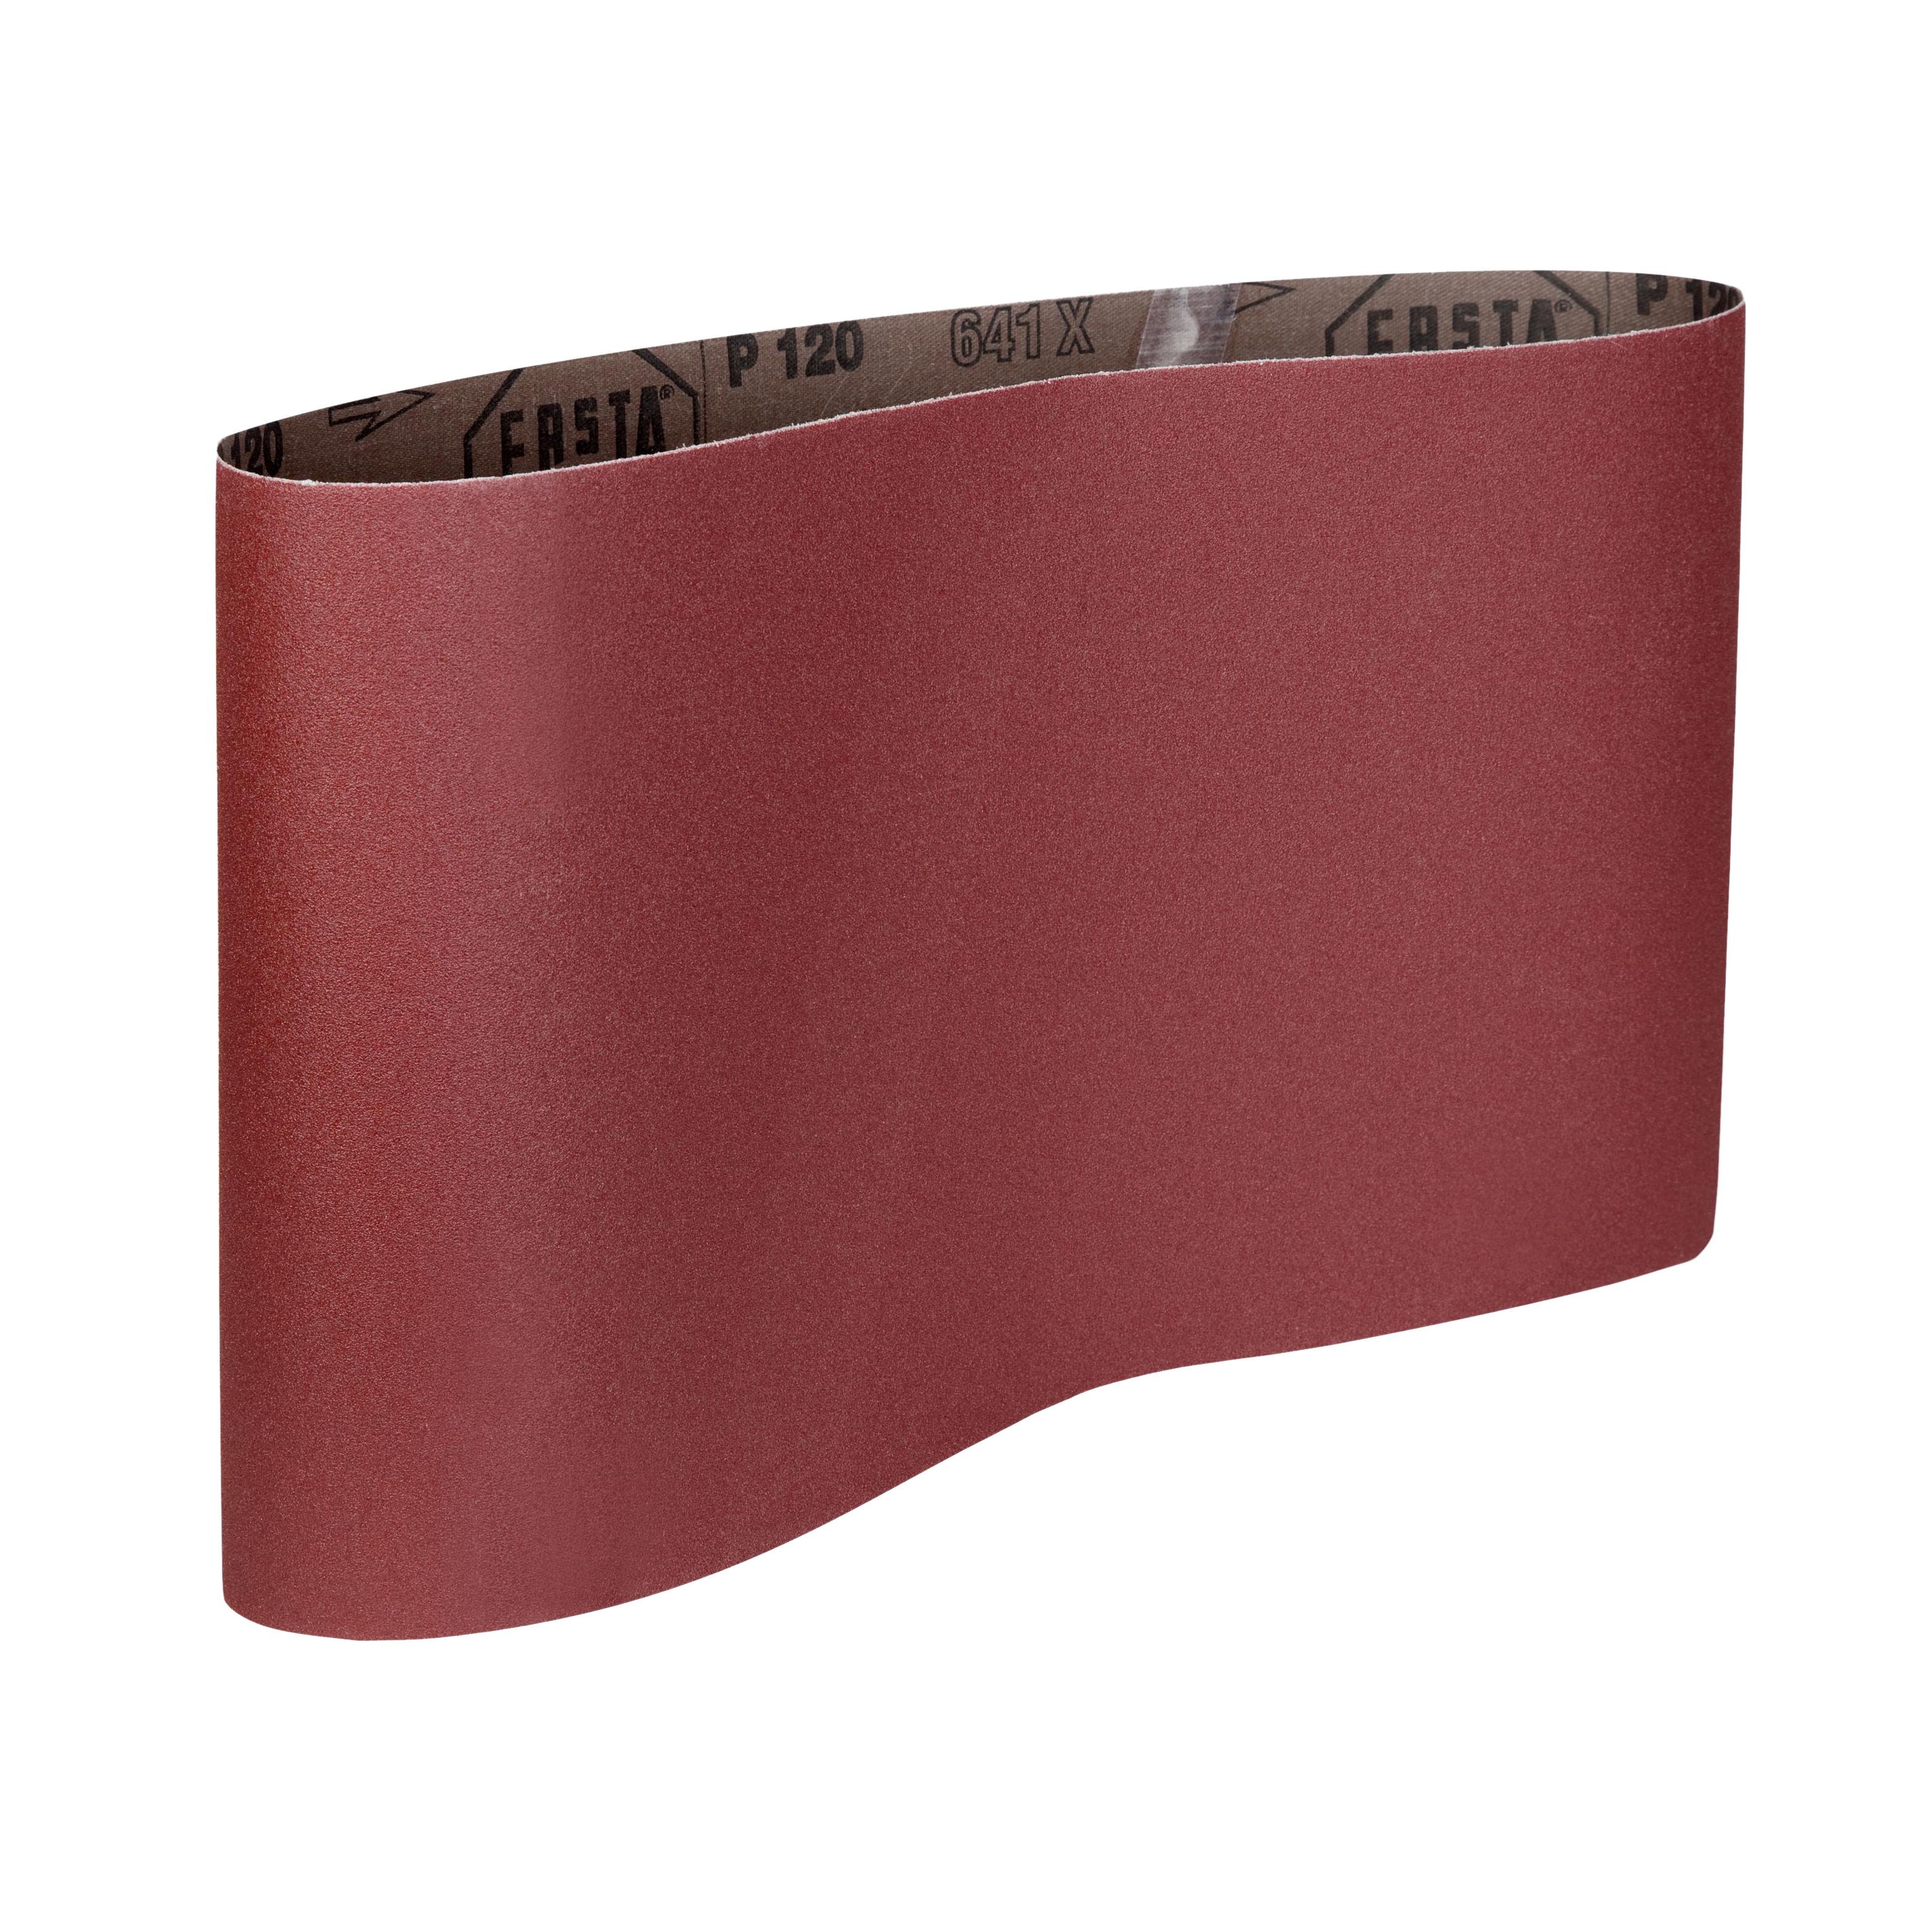 K 40 Parat Belts abrasive belt 200x750mm